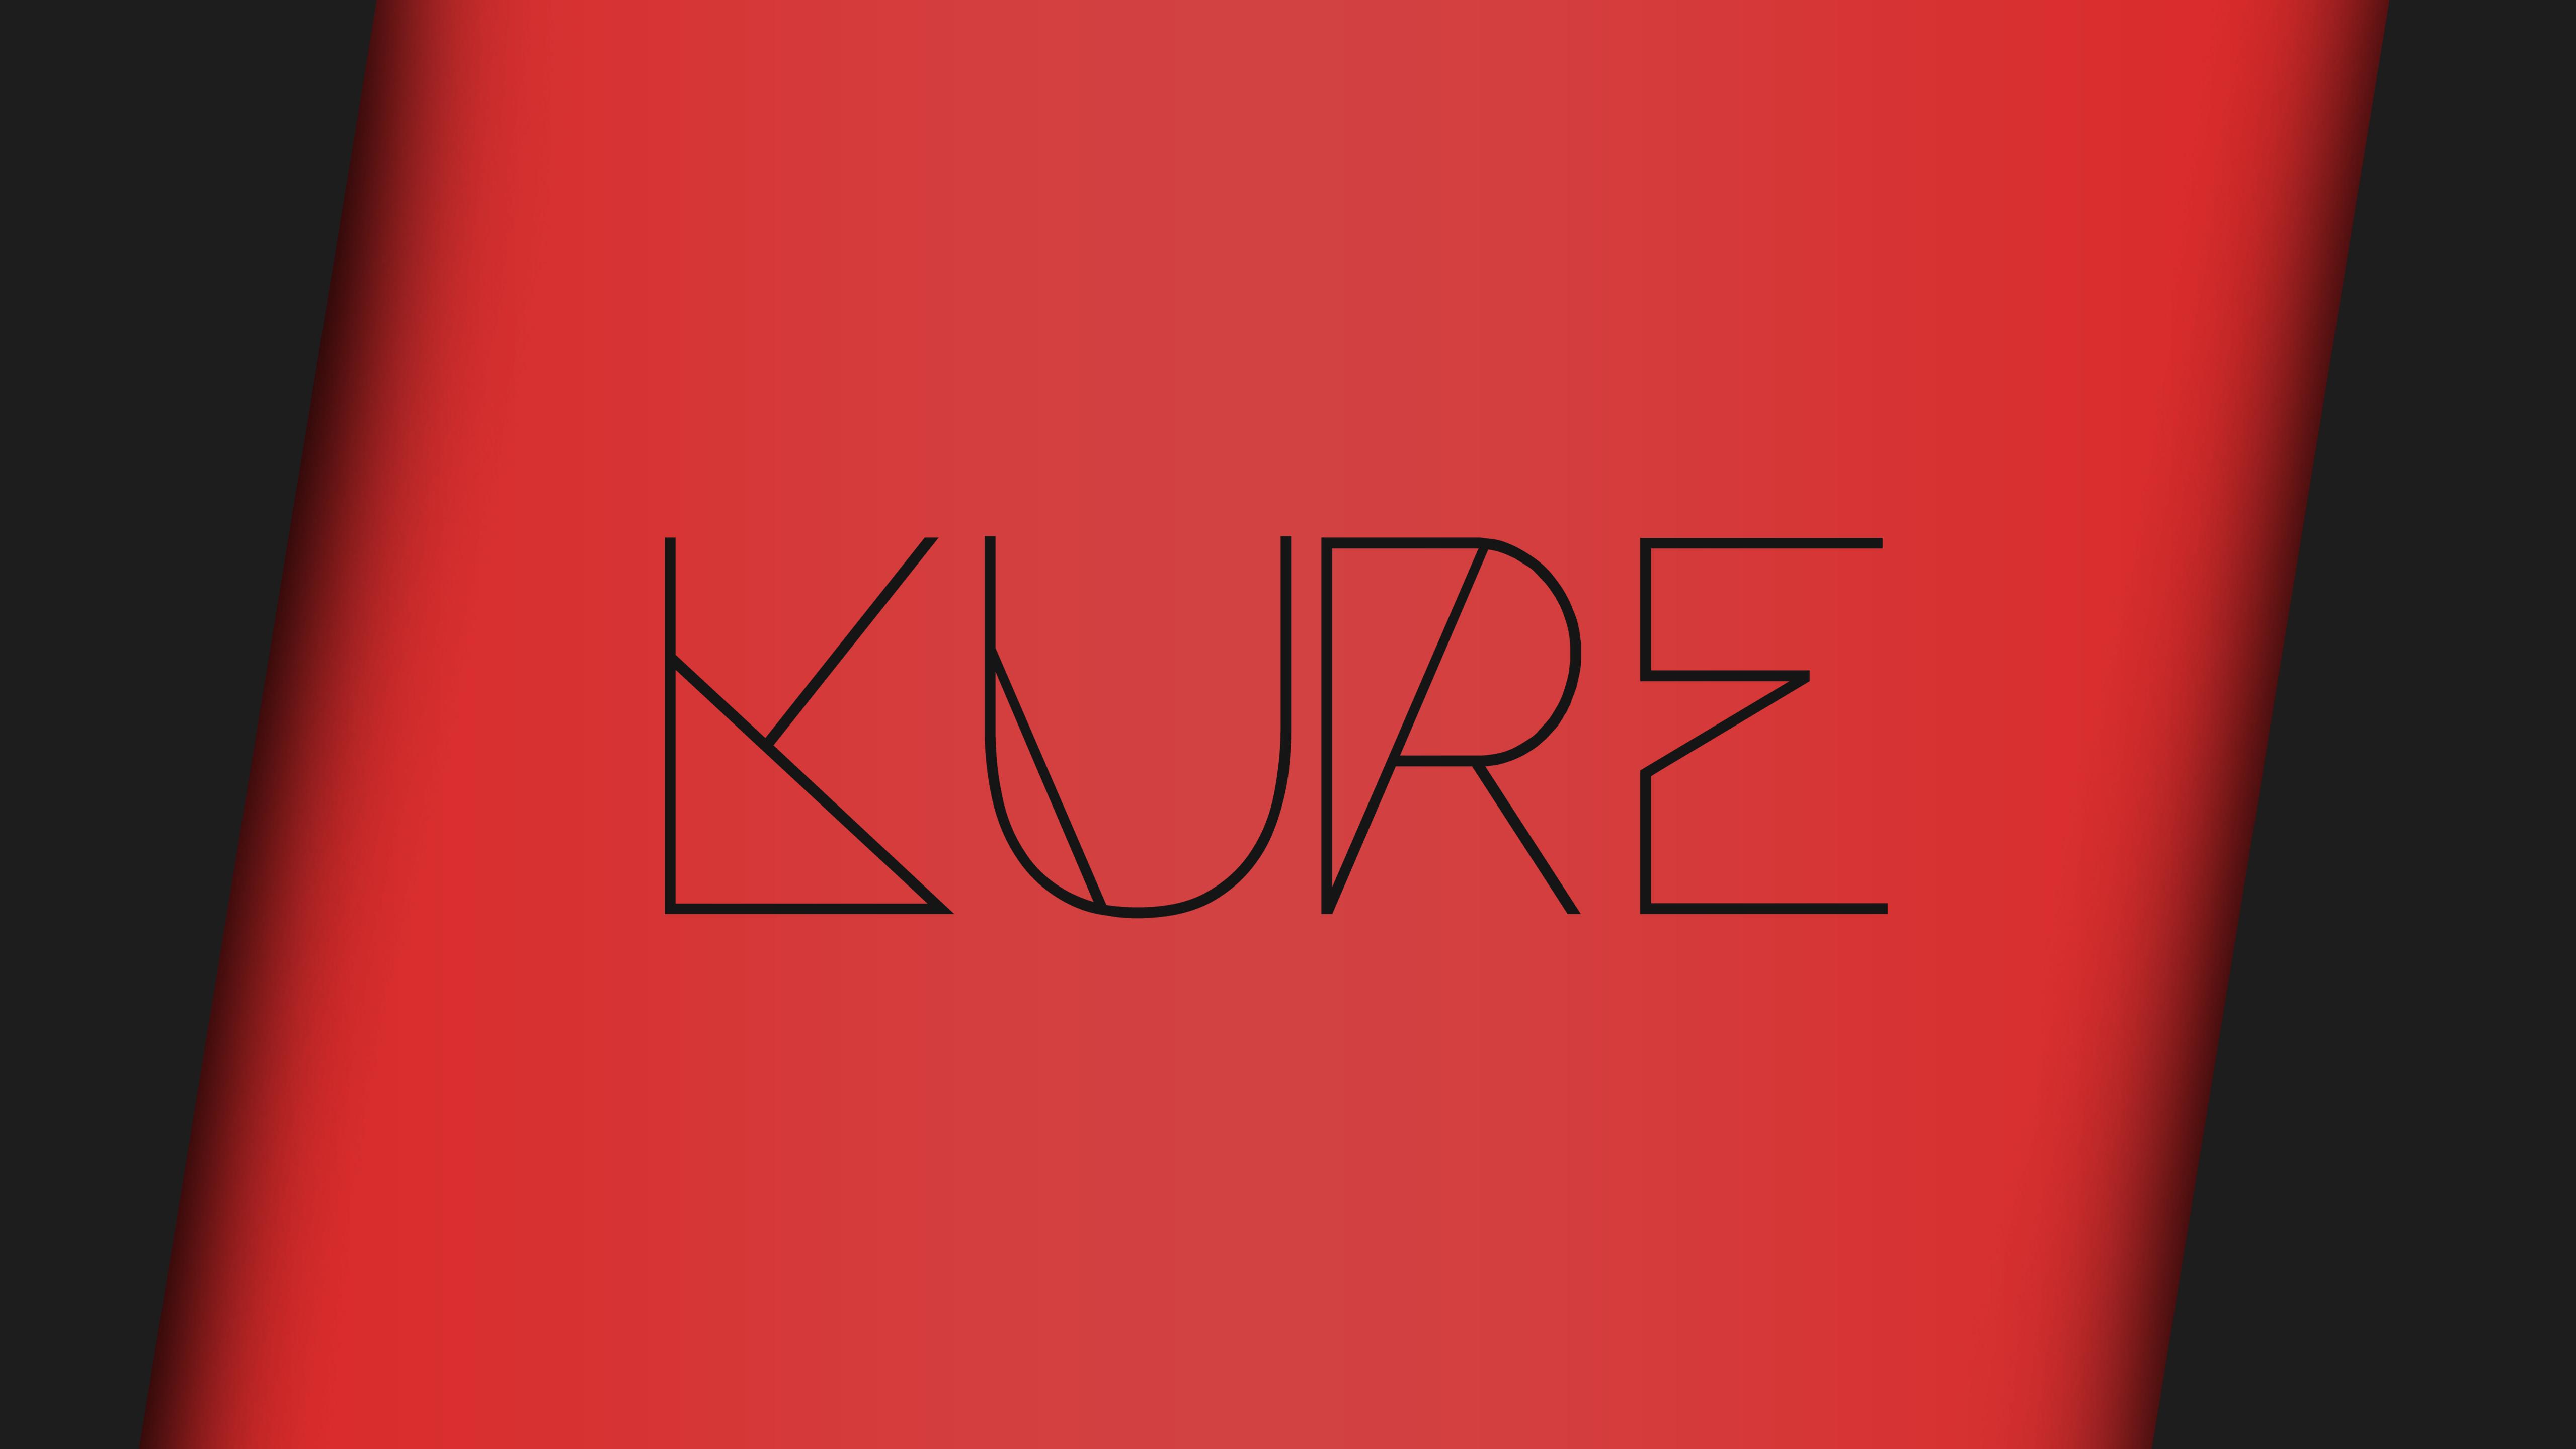 FREE 2017] Alex Kure Trap Drum Kit | Download in Desc  by Alex Kure